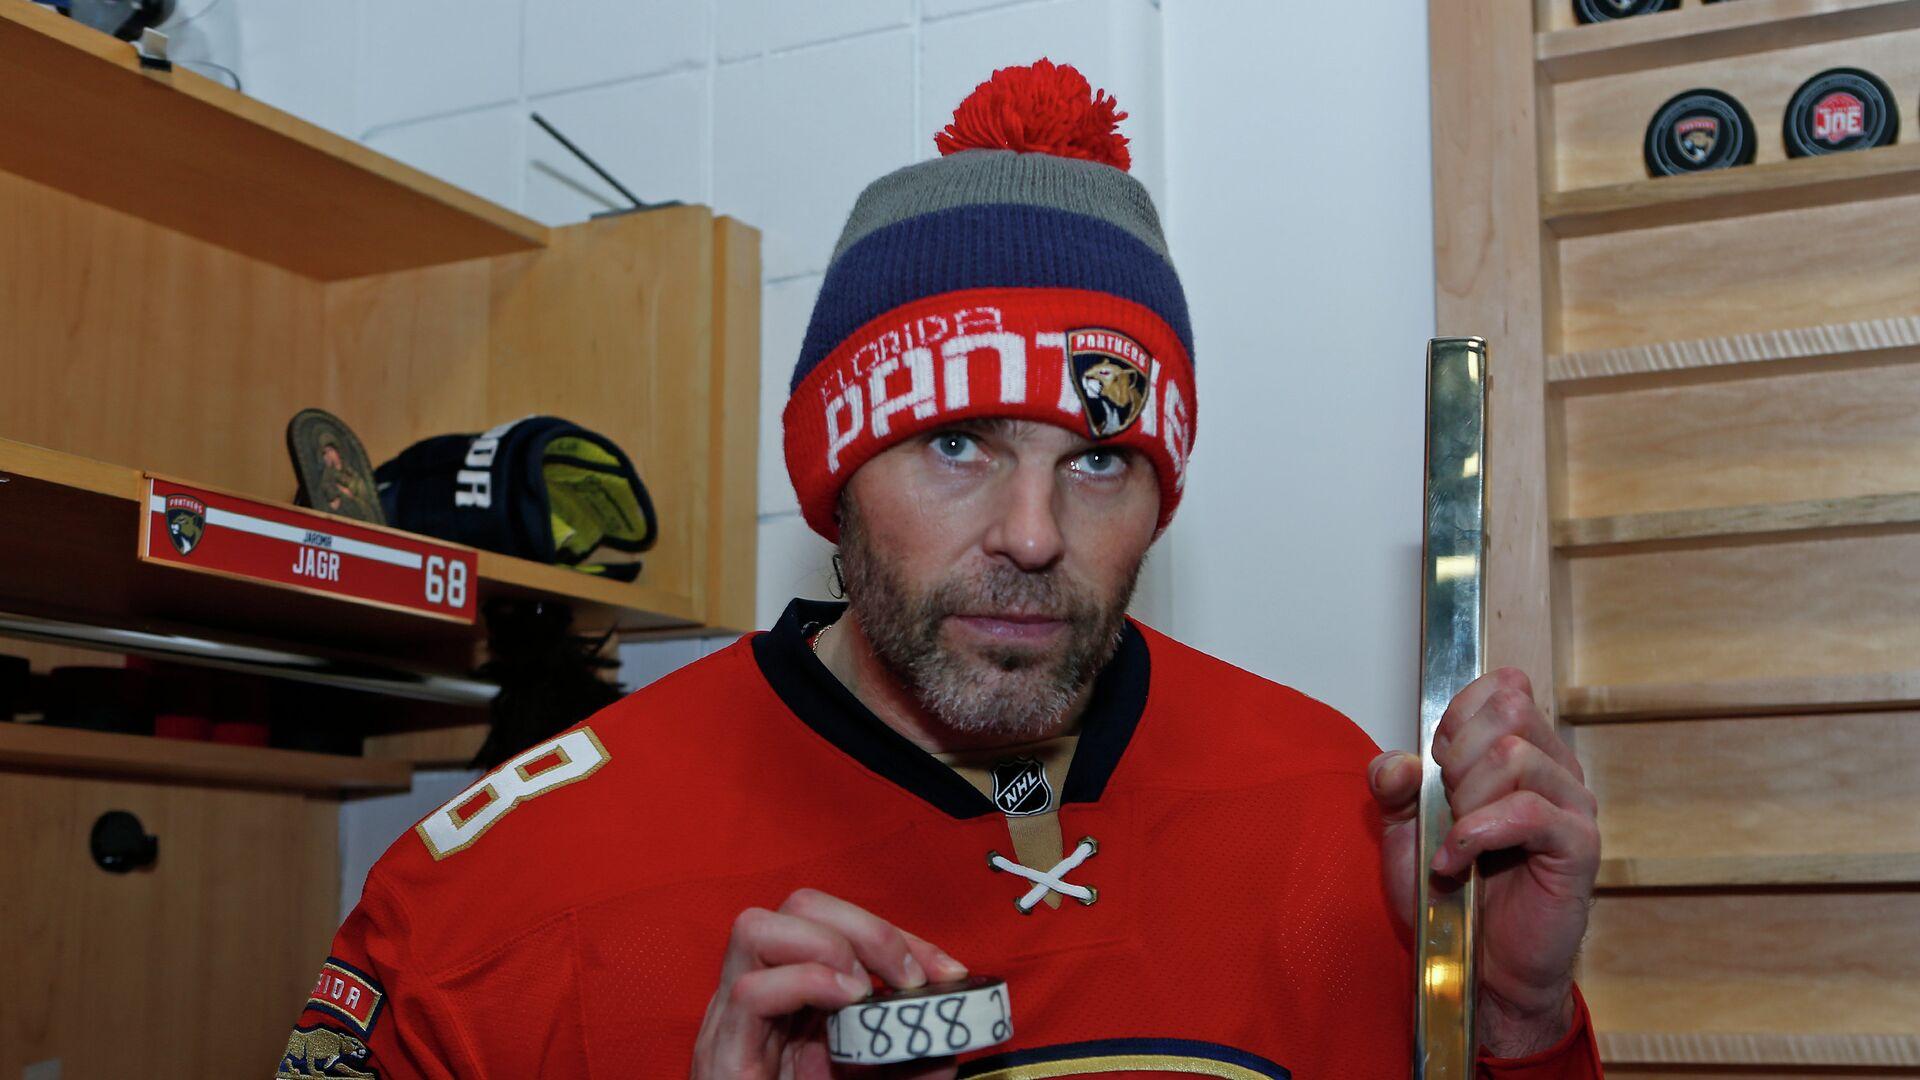 Форвард Флориды Яромир Ягр, набравший 1888-е очко в регулярных чемпионатах НХЛ - РИА Новости, 1920, 23.11.2020